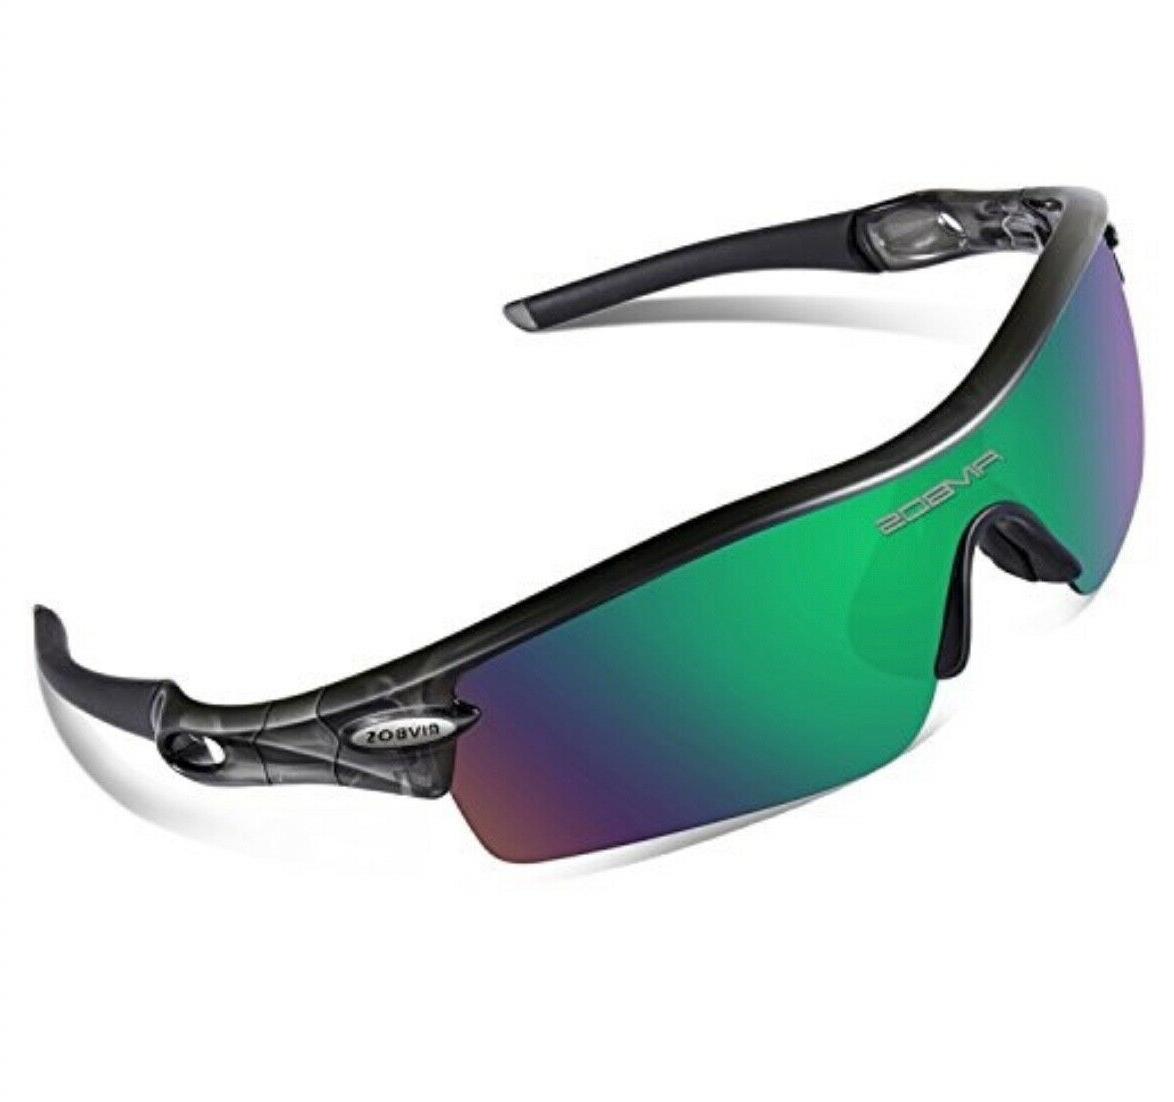 805 polarized sports sunglasses with 5 set